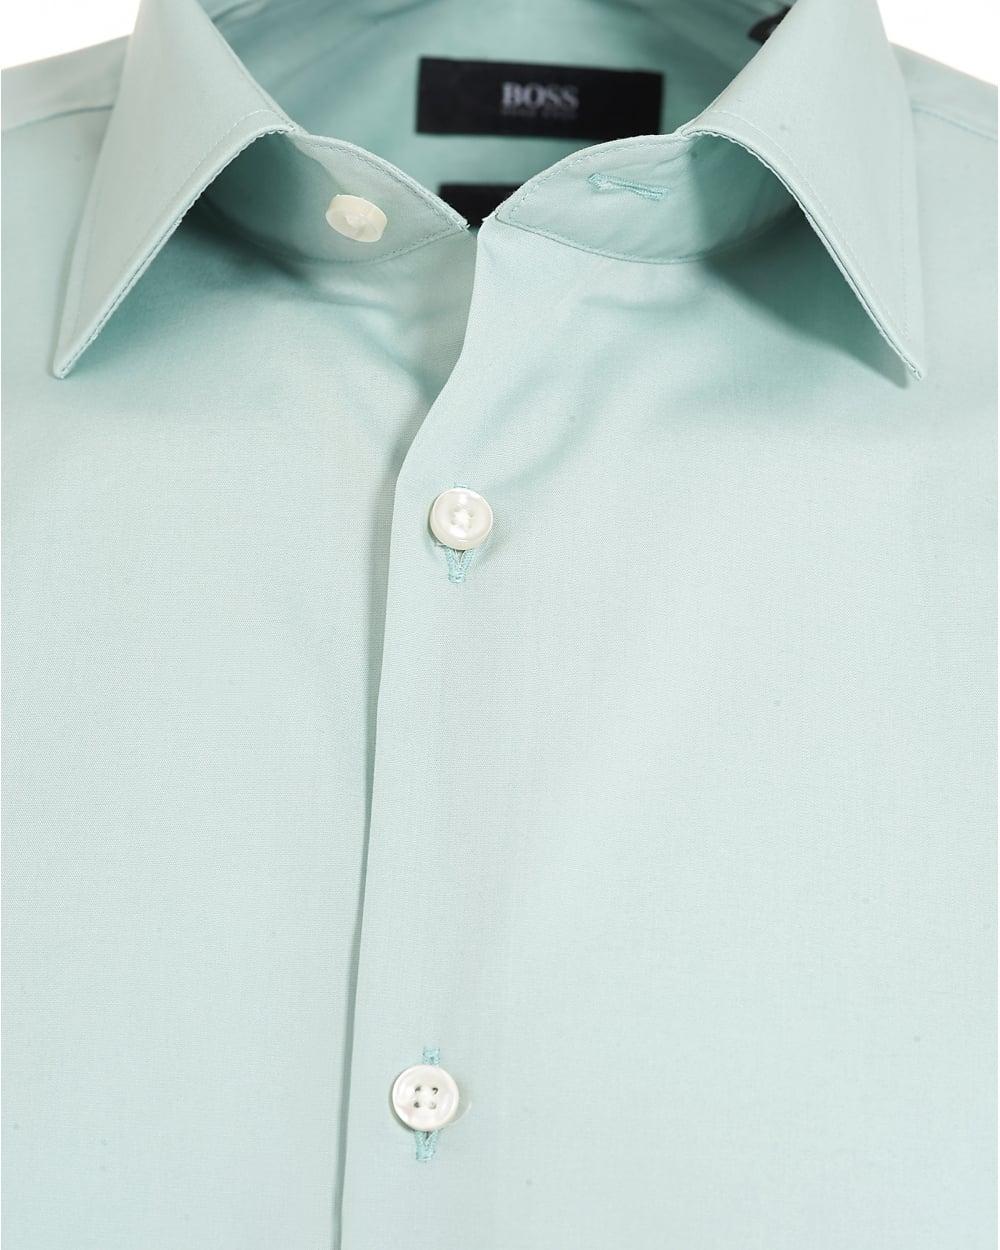 Hugo Boss Classic Mens Jenno Shirt Mint Green Slim Fit Plain Shirt